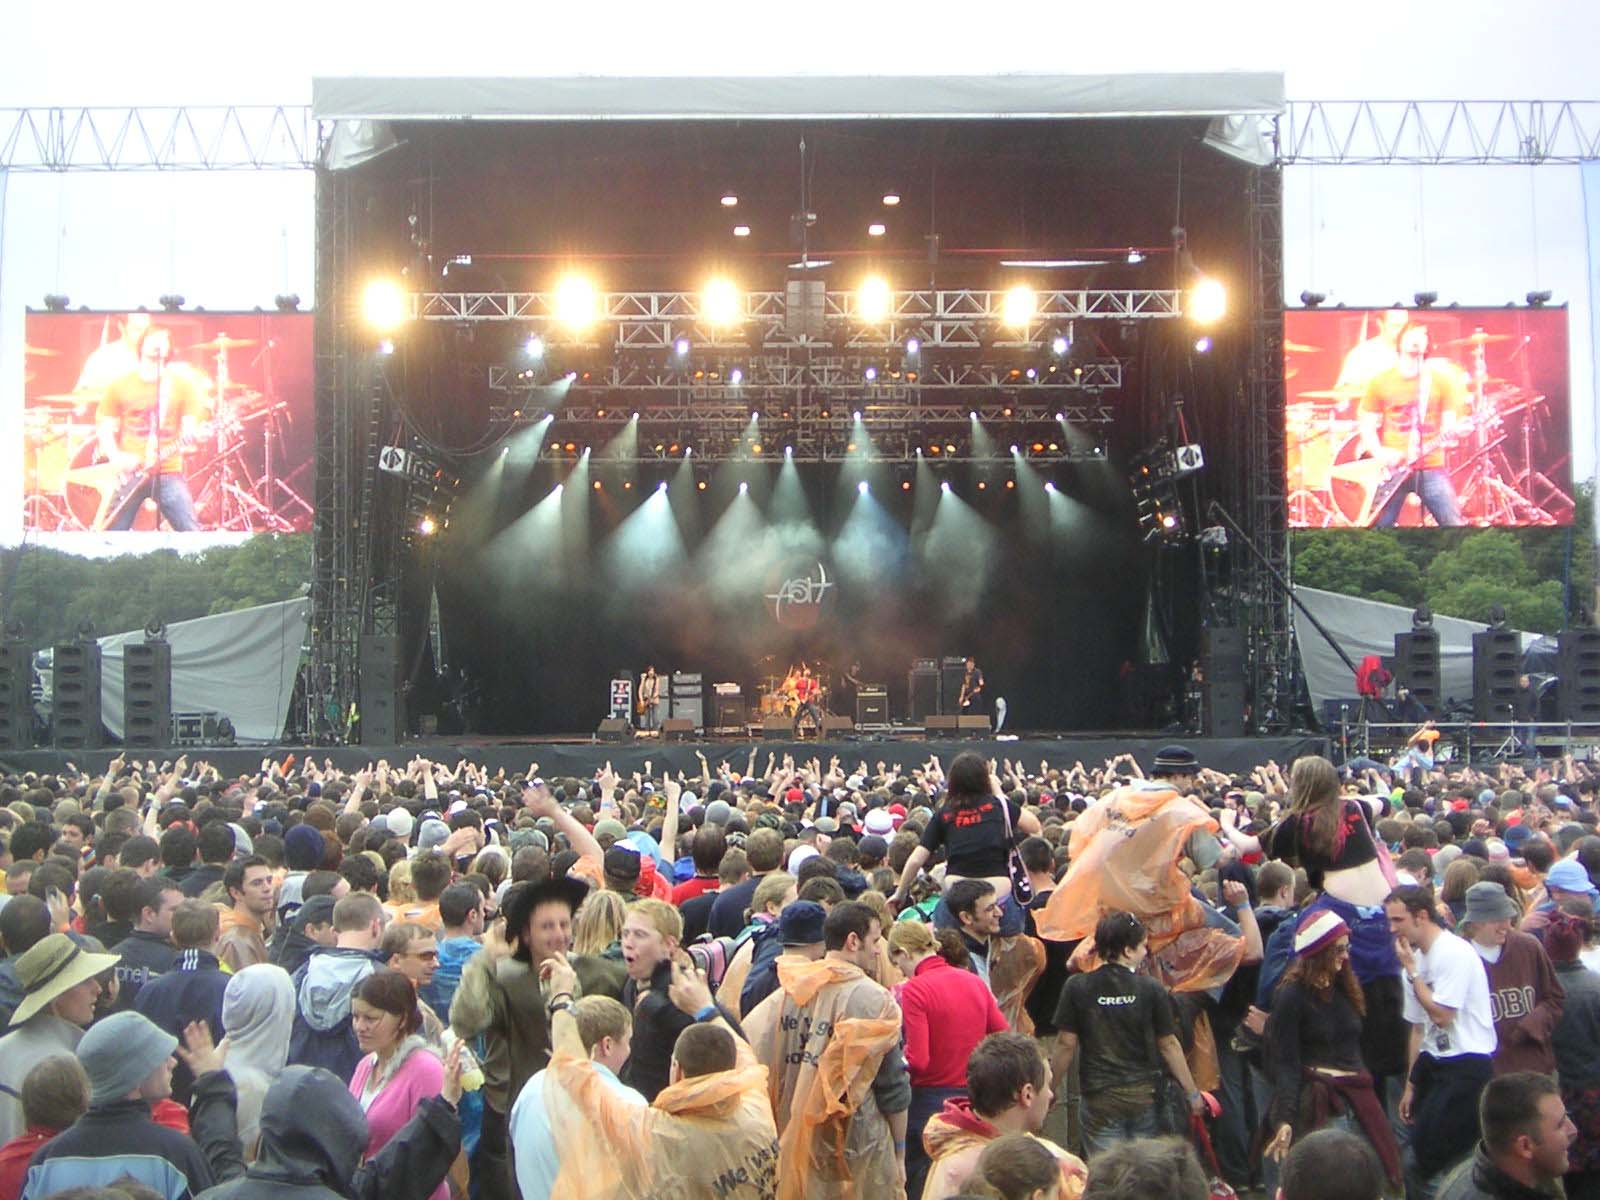 Oxegen Music Festival 2011